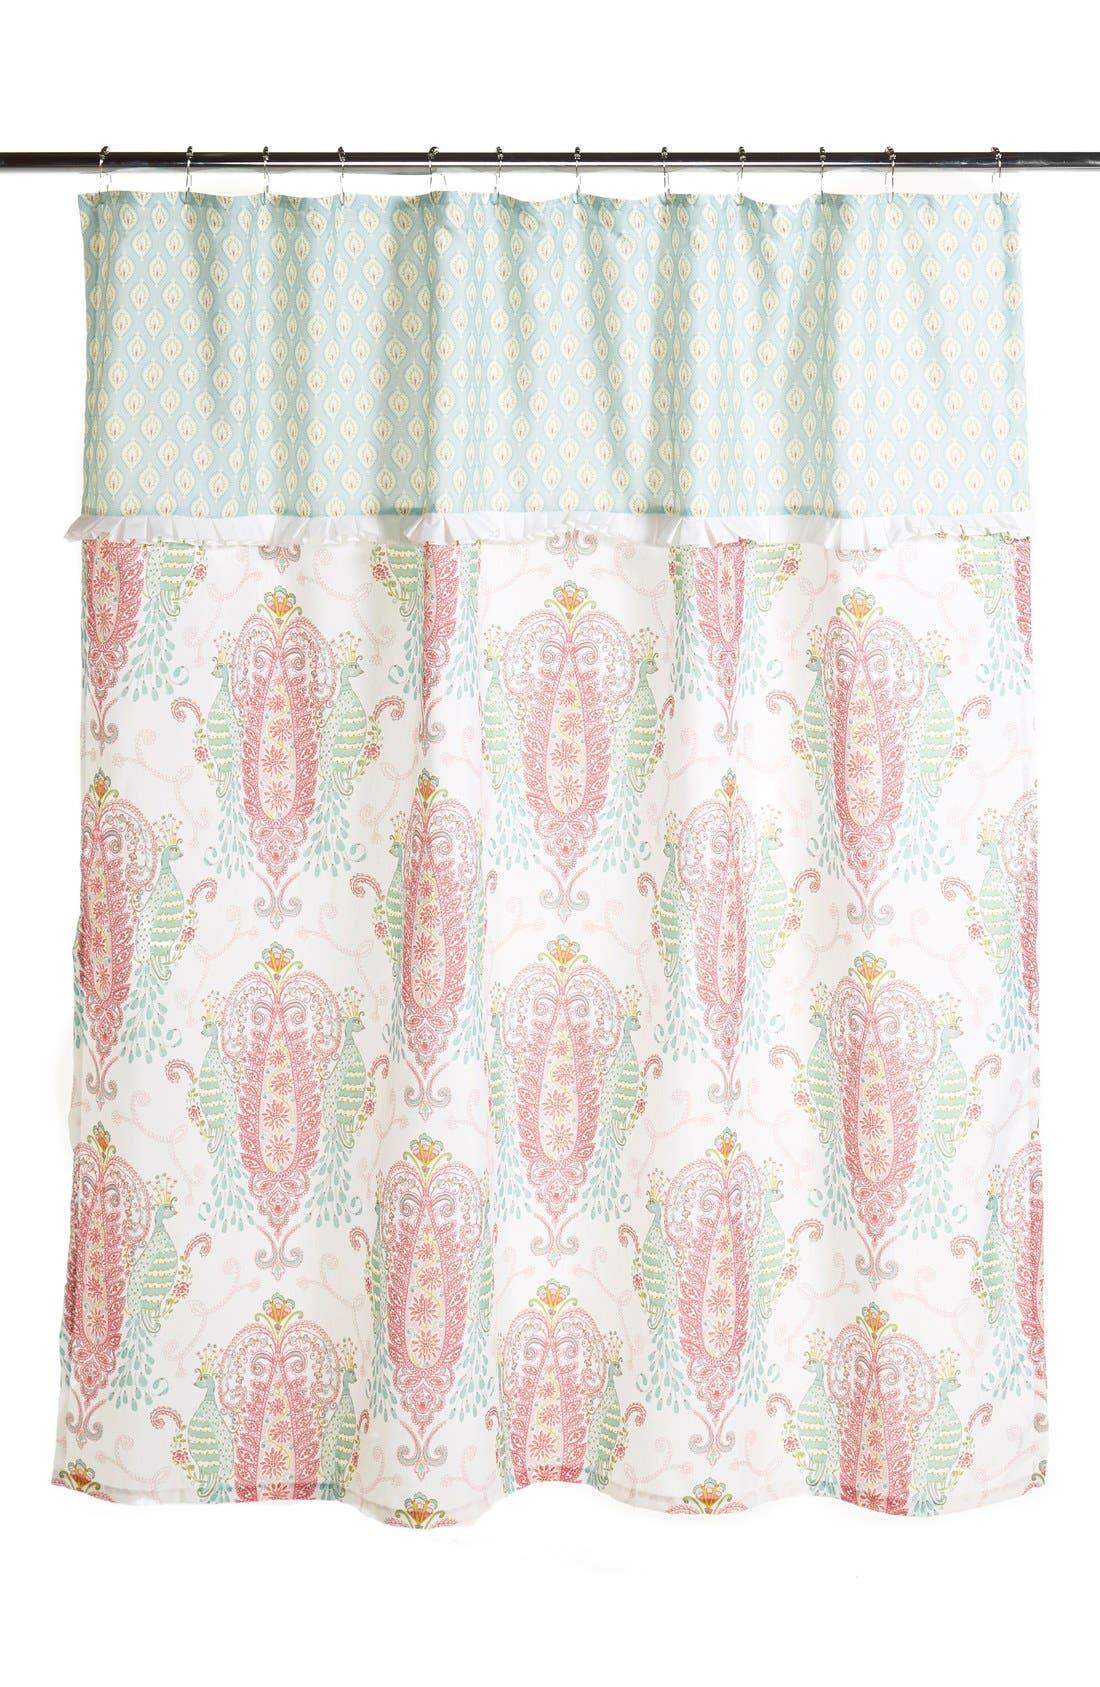 Dena Home 'Peacock' Shower Curtain